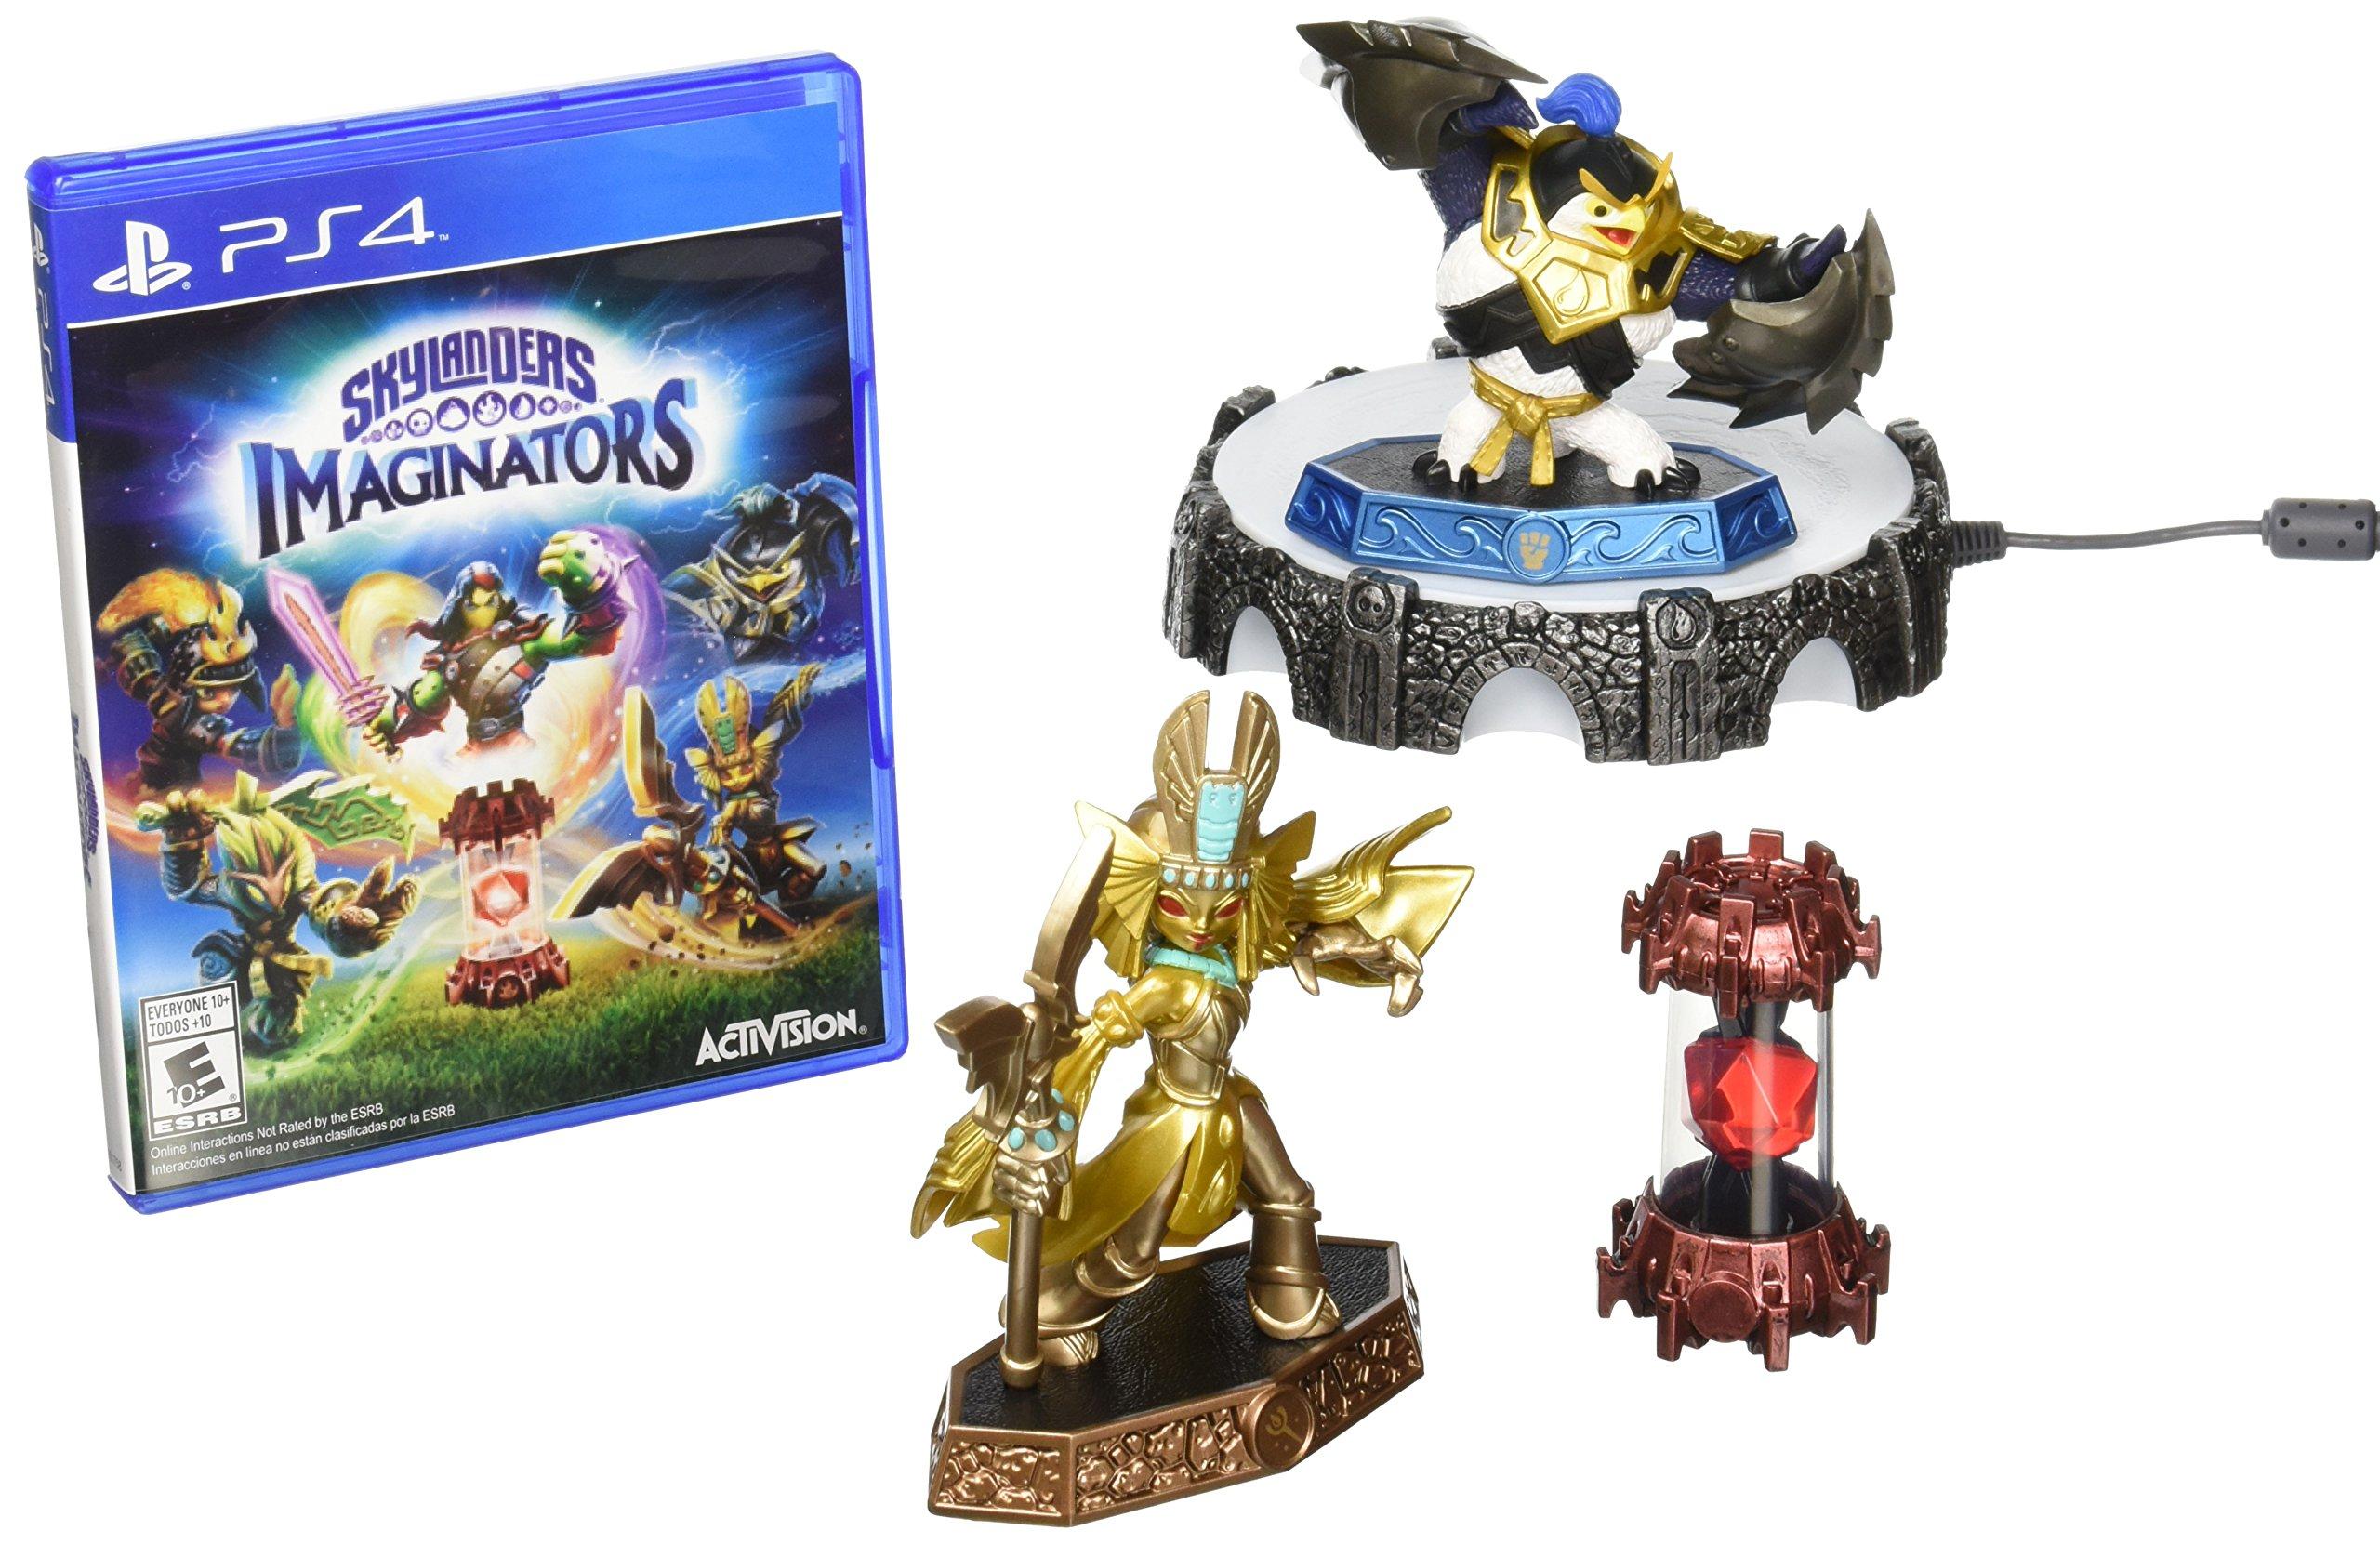 PS4 Skylanders: Imaginators Starter Pack US Version: Amazon.es: Videojuegos